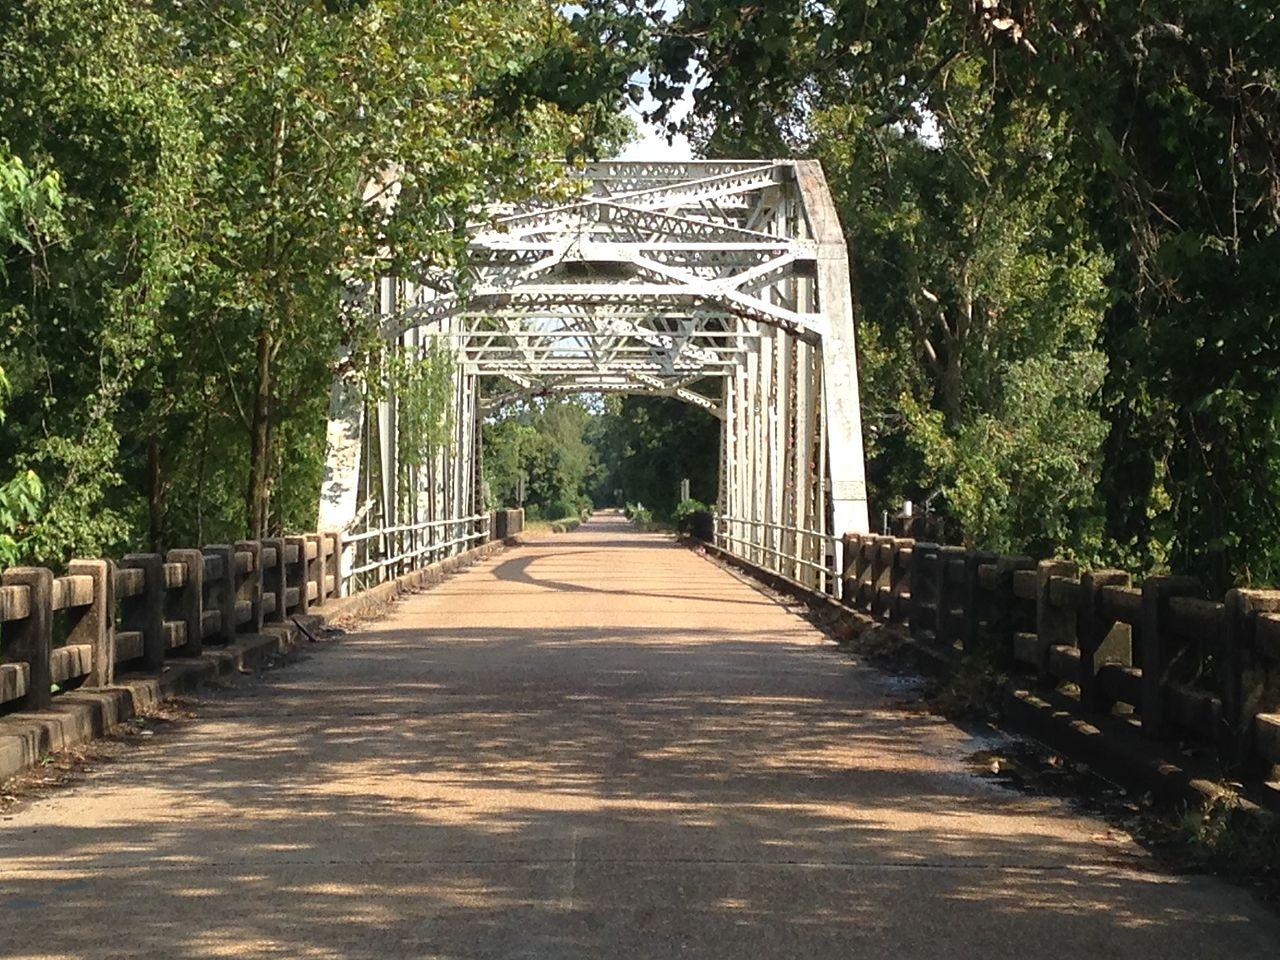 https://upload.wikimedia.org/wikipedia/commons/thumb/b/b3/R.H._Henry_Bridge.jpg/1280px-R.H._Henry_Bridge.jpg